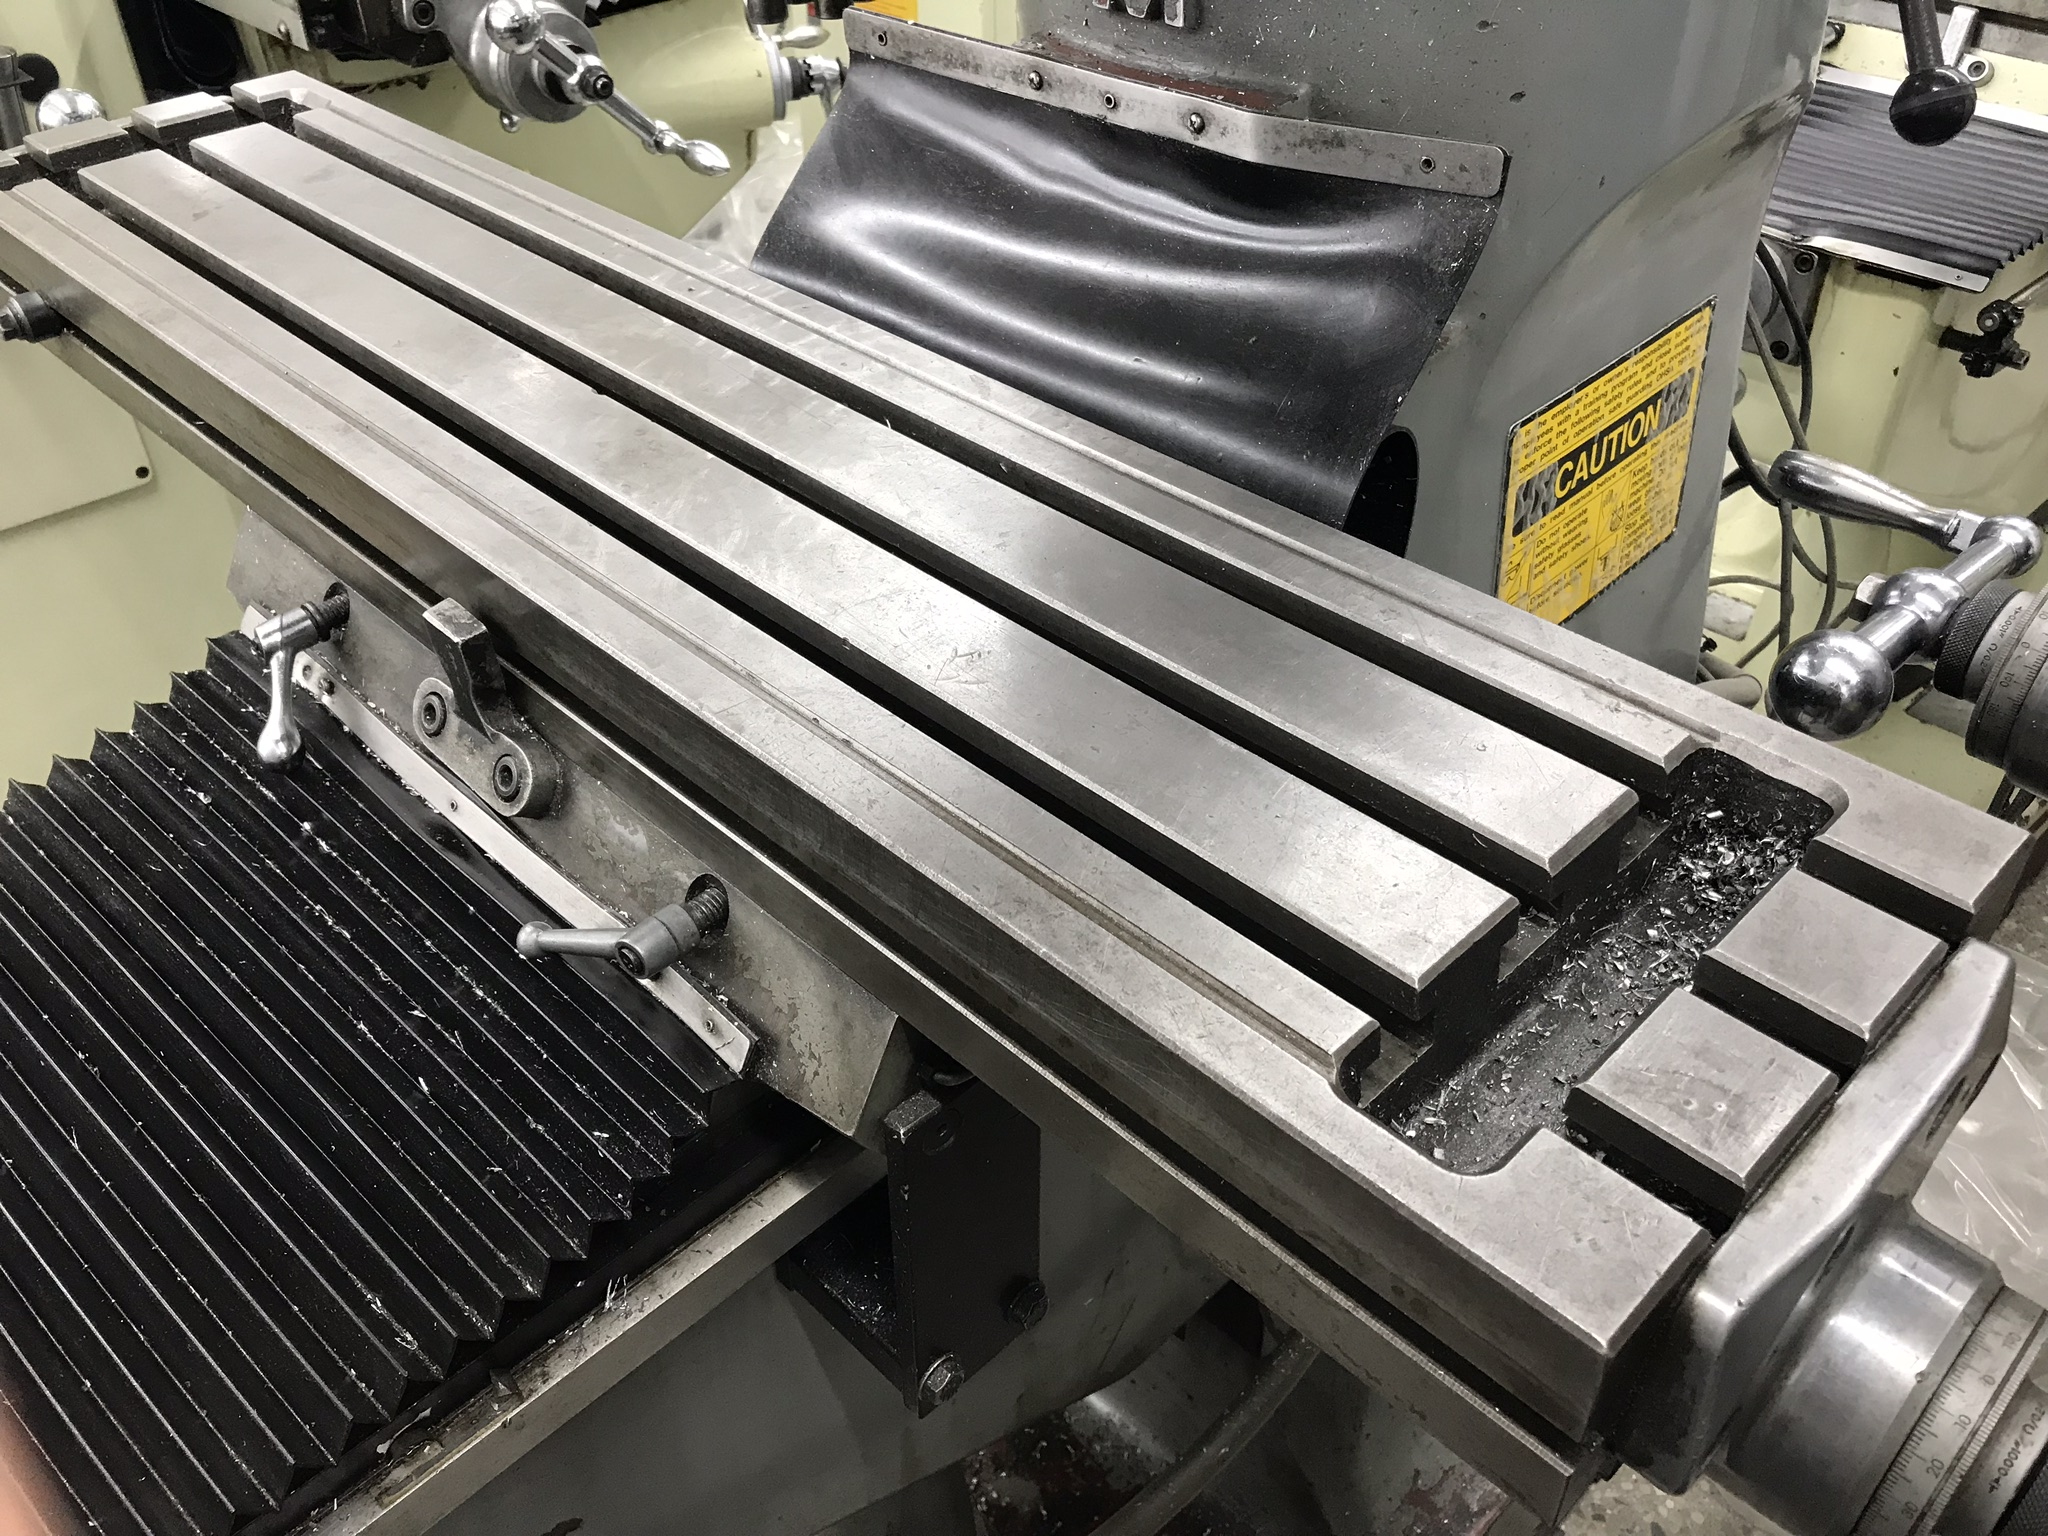 "Supermax Titan Series Vertical Mill Model YO-1.5VS-T, 9"" x 42"" Table Sargon 3- Axis DRO, Collets, - Image 3 of 4"